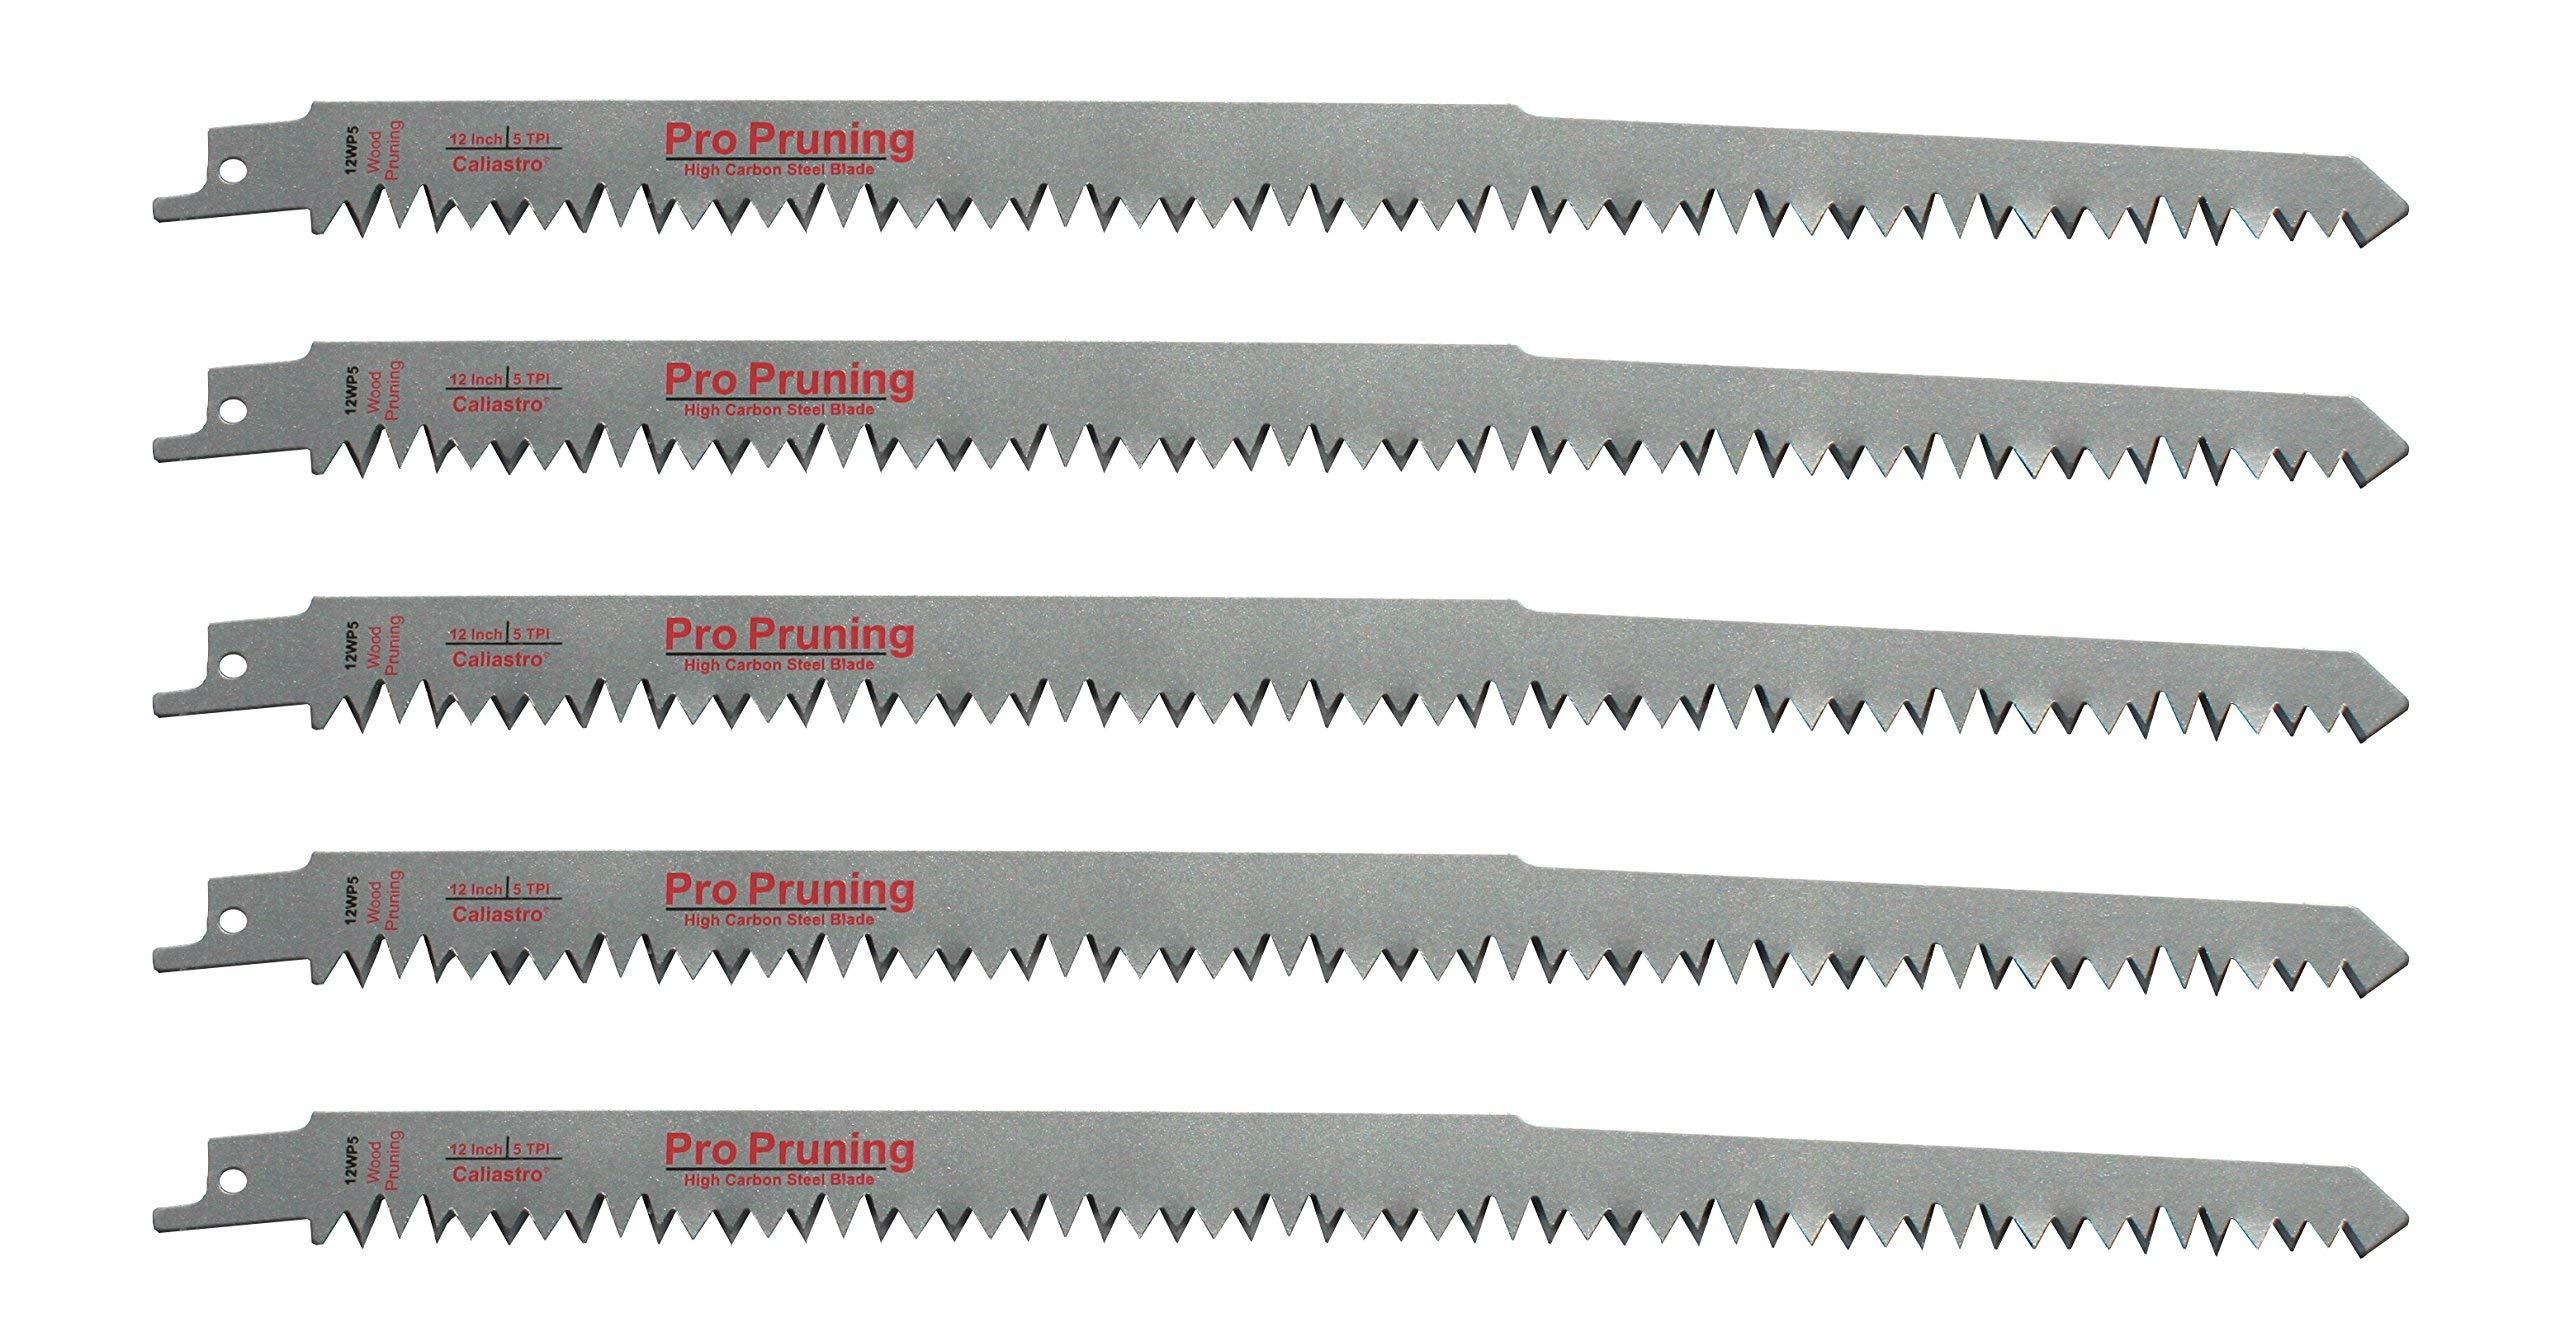 12 Inch Pruning Reciprocating Sawzall Blades